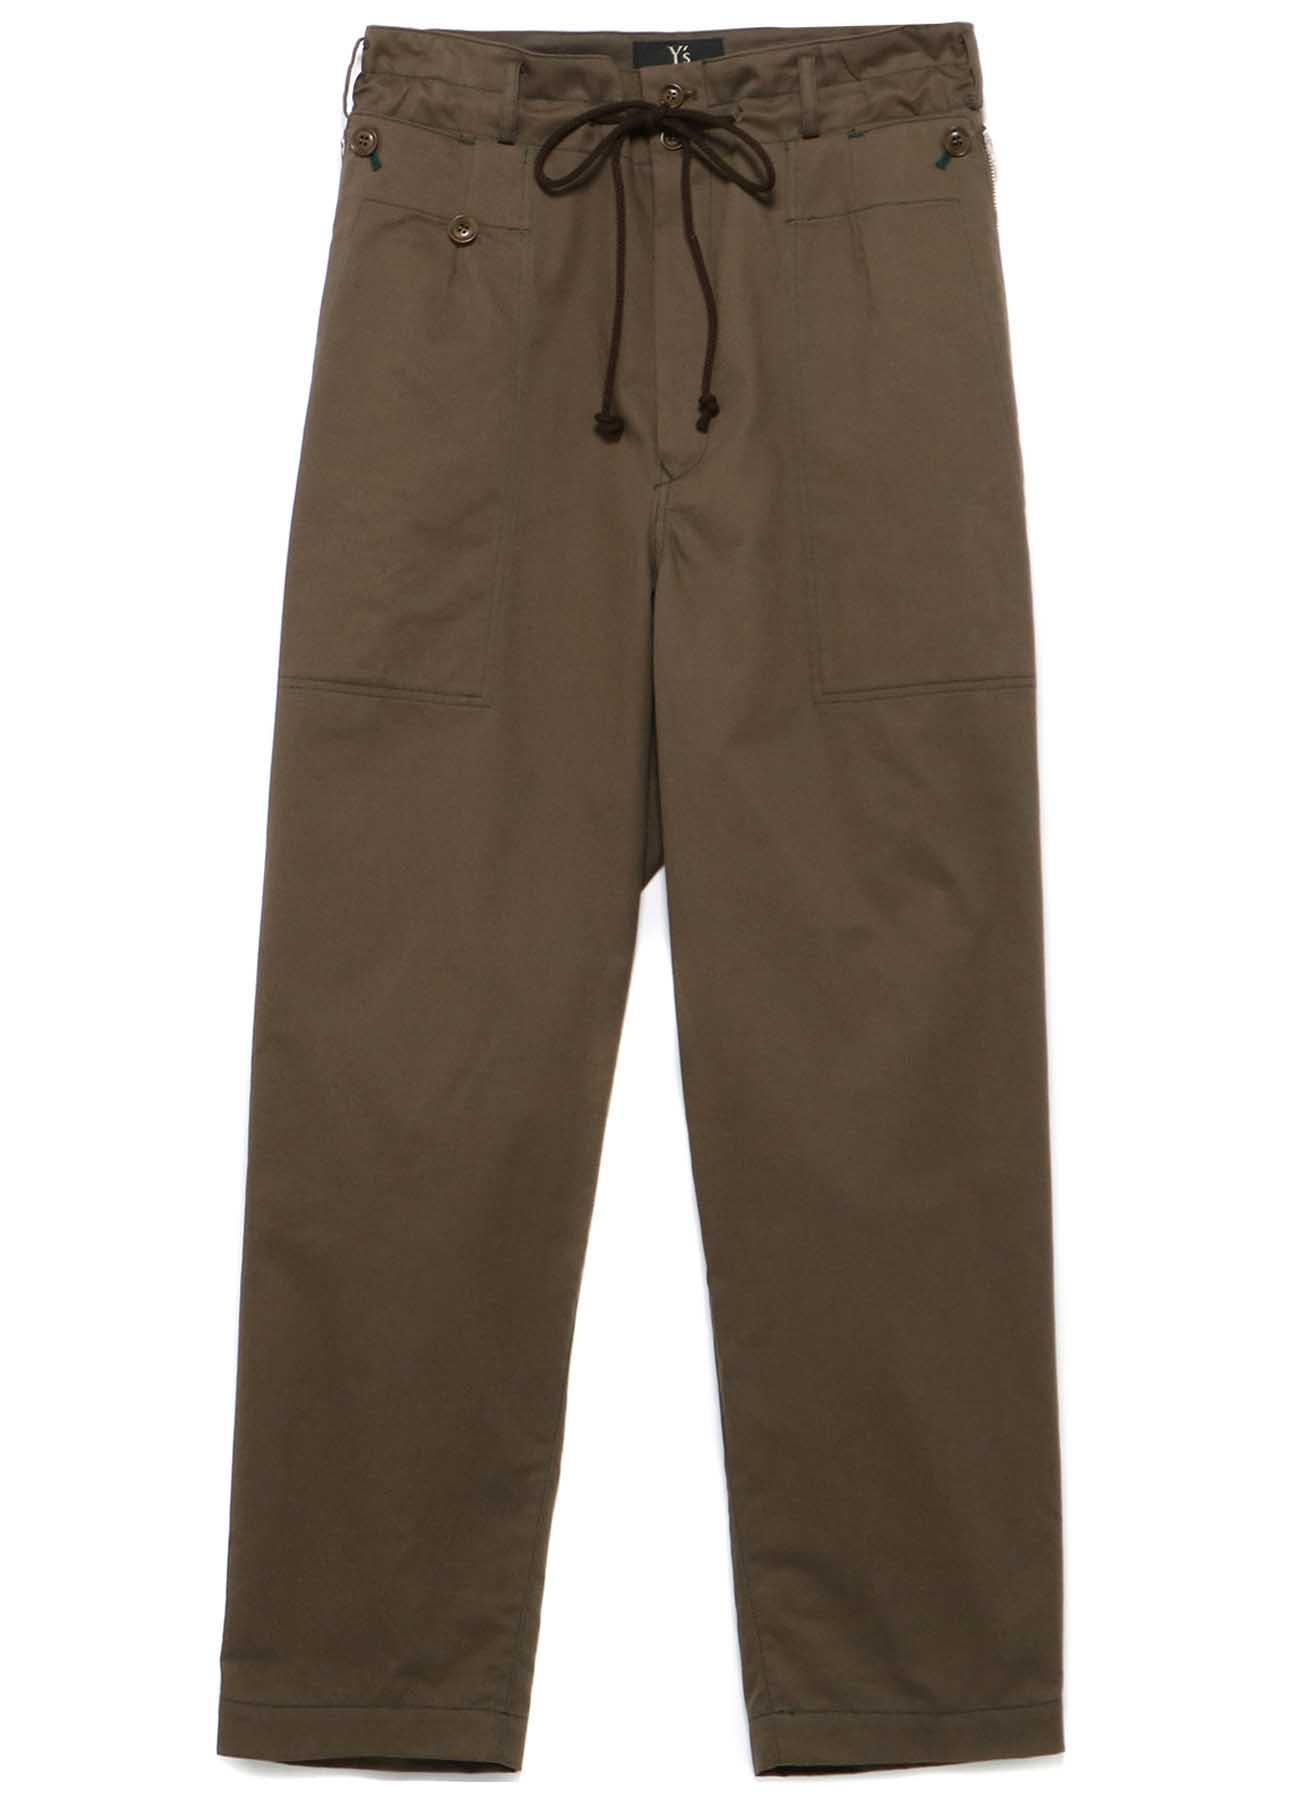 SOFT CHINO CLOTH ZIPPER POCKET PANTS